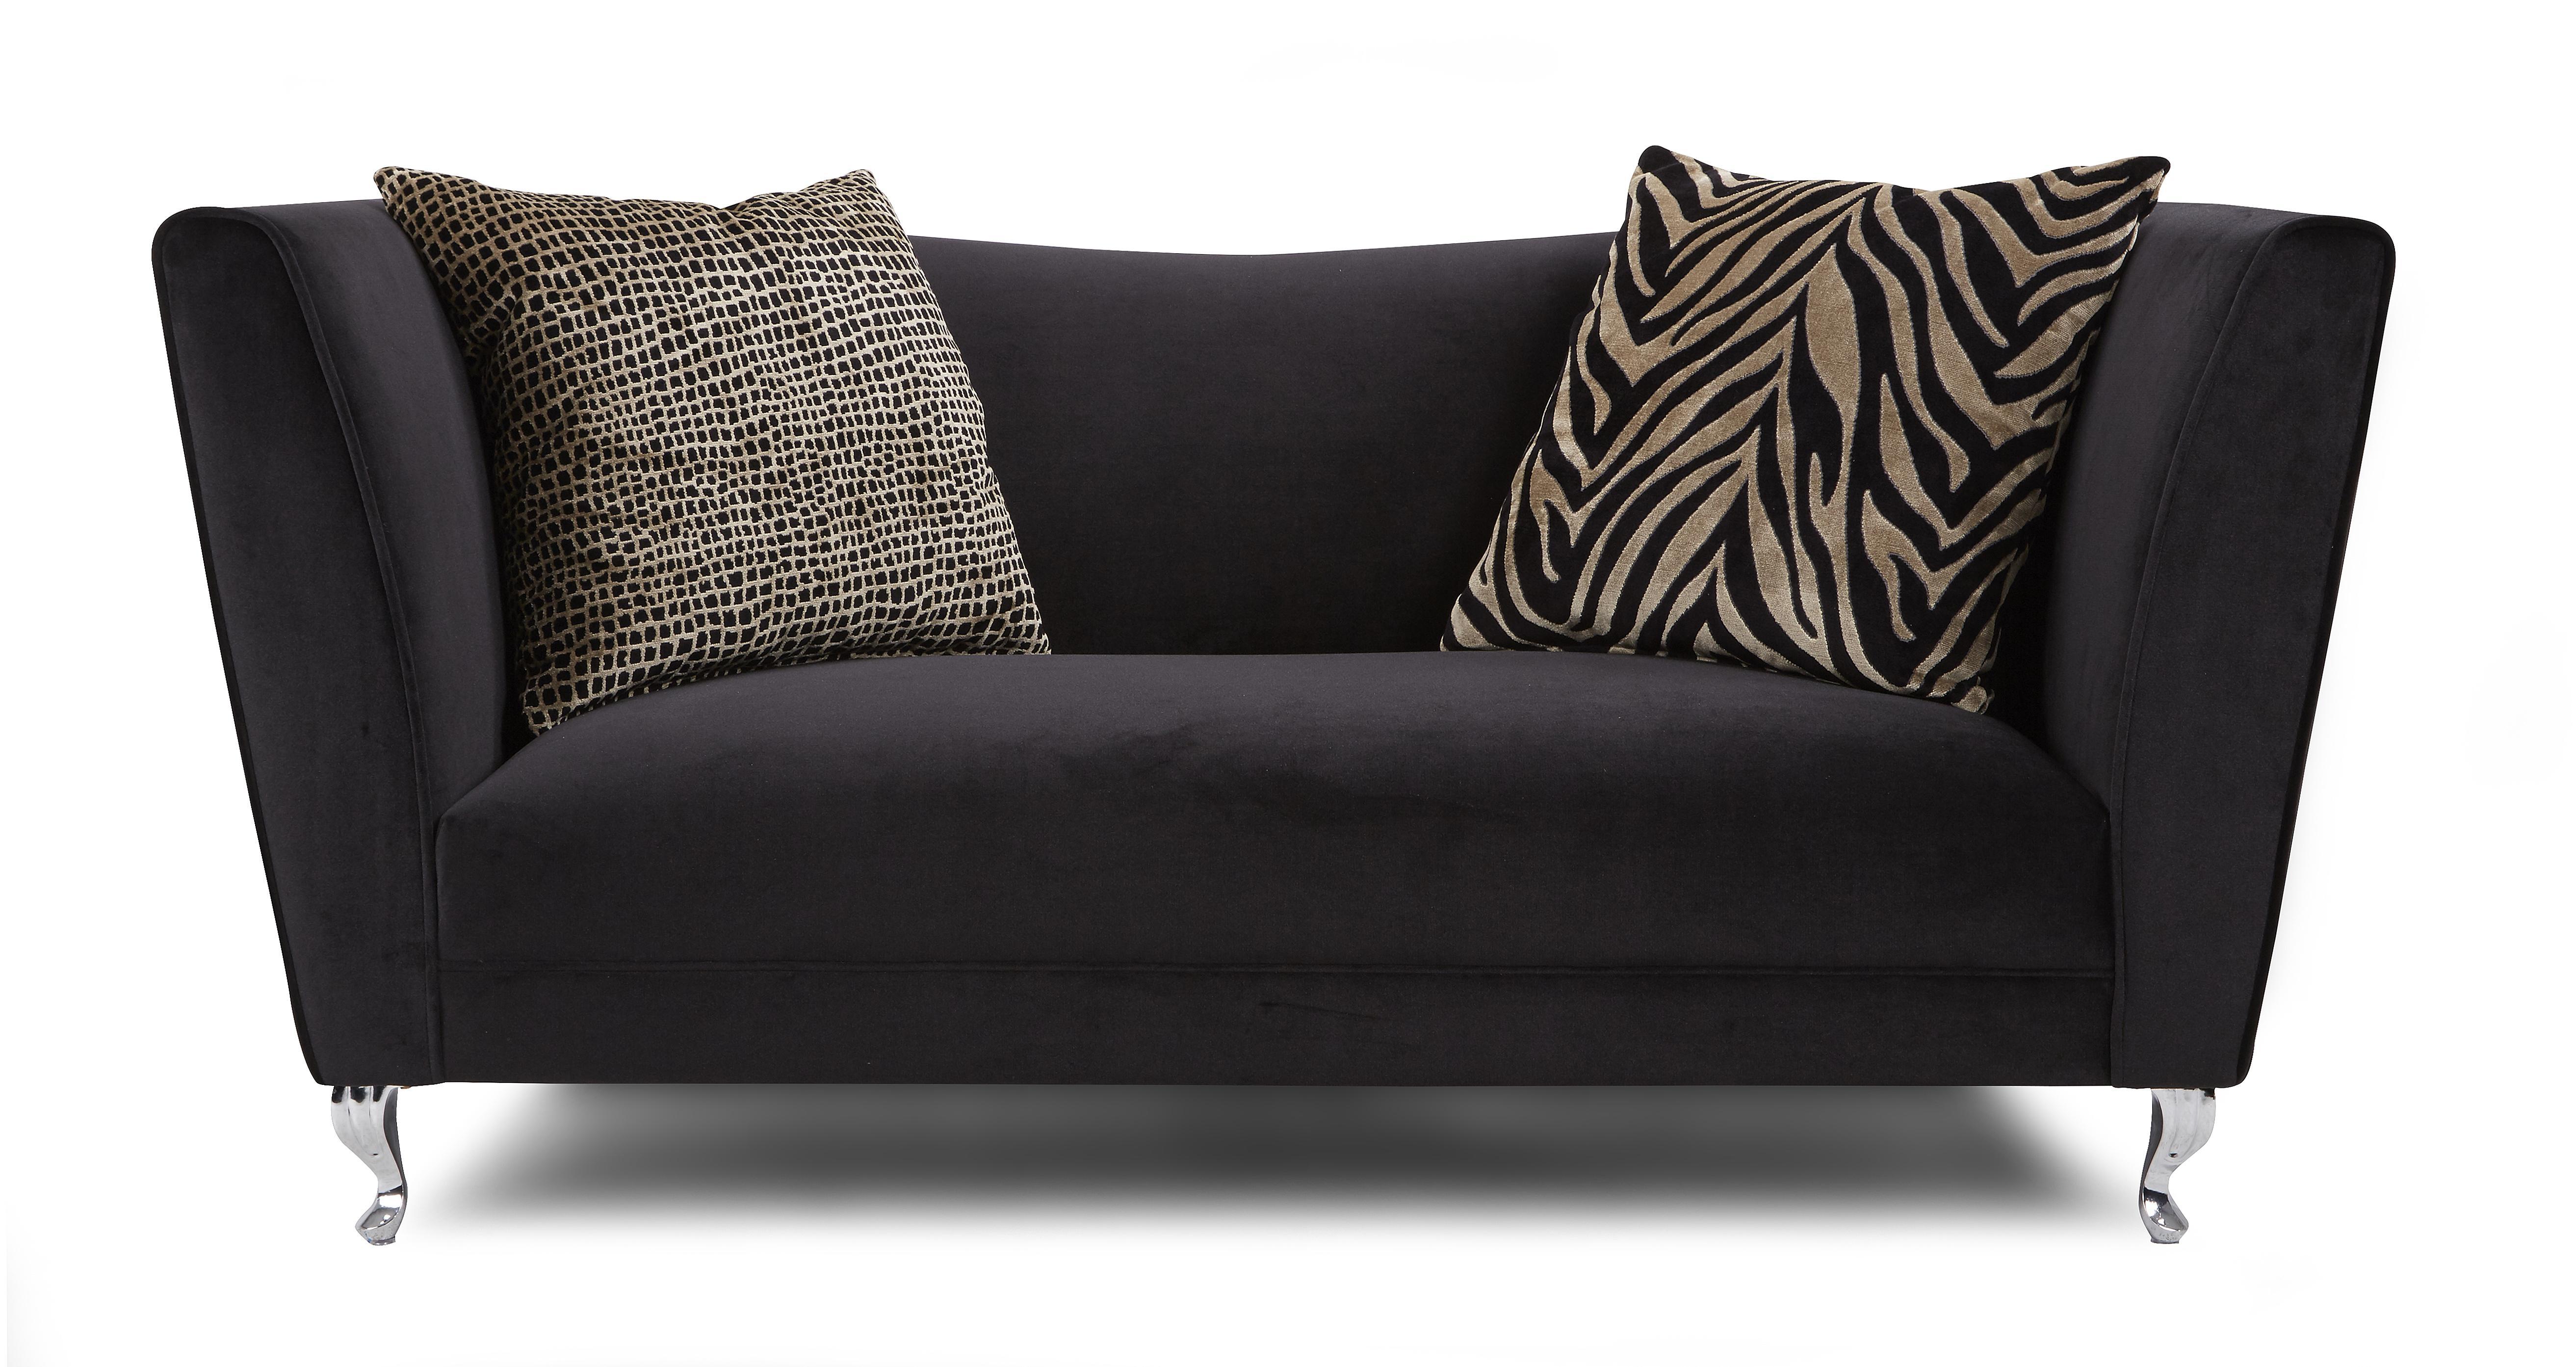 Groovy Madagascar Plain 2 Seater Sofa Caraccident5 Cool Chair Designs And Ideas Caraccident5Info